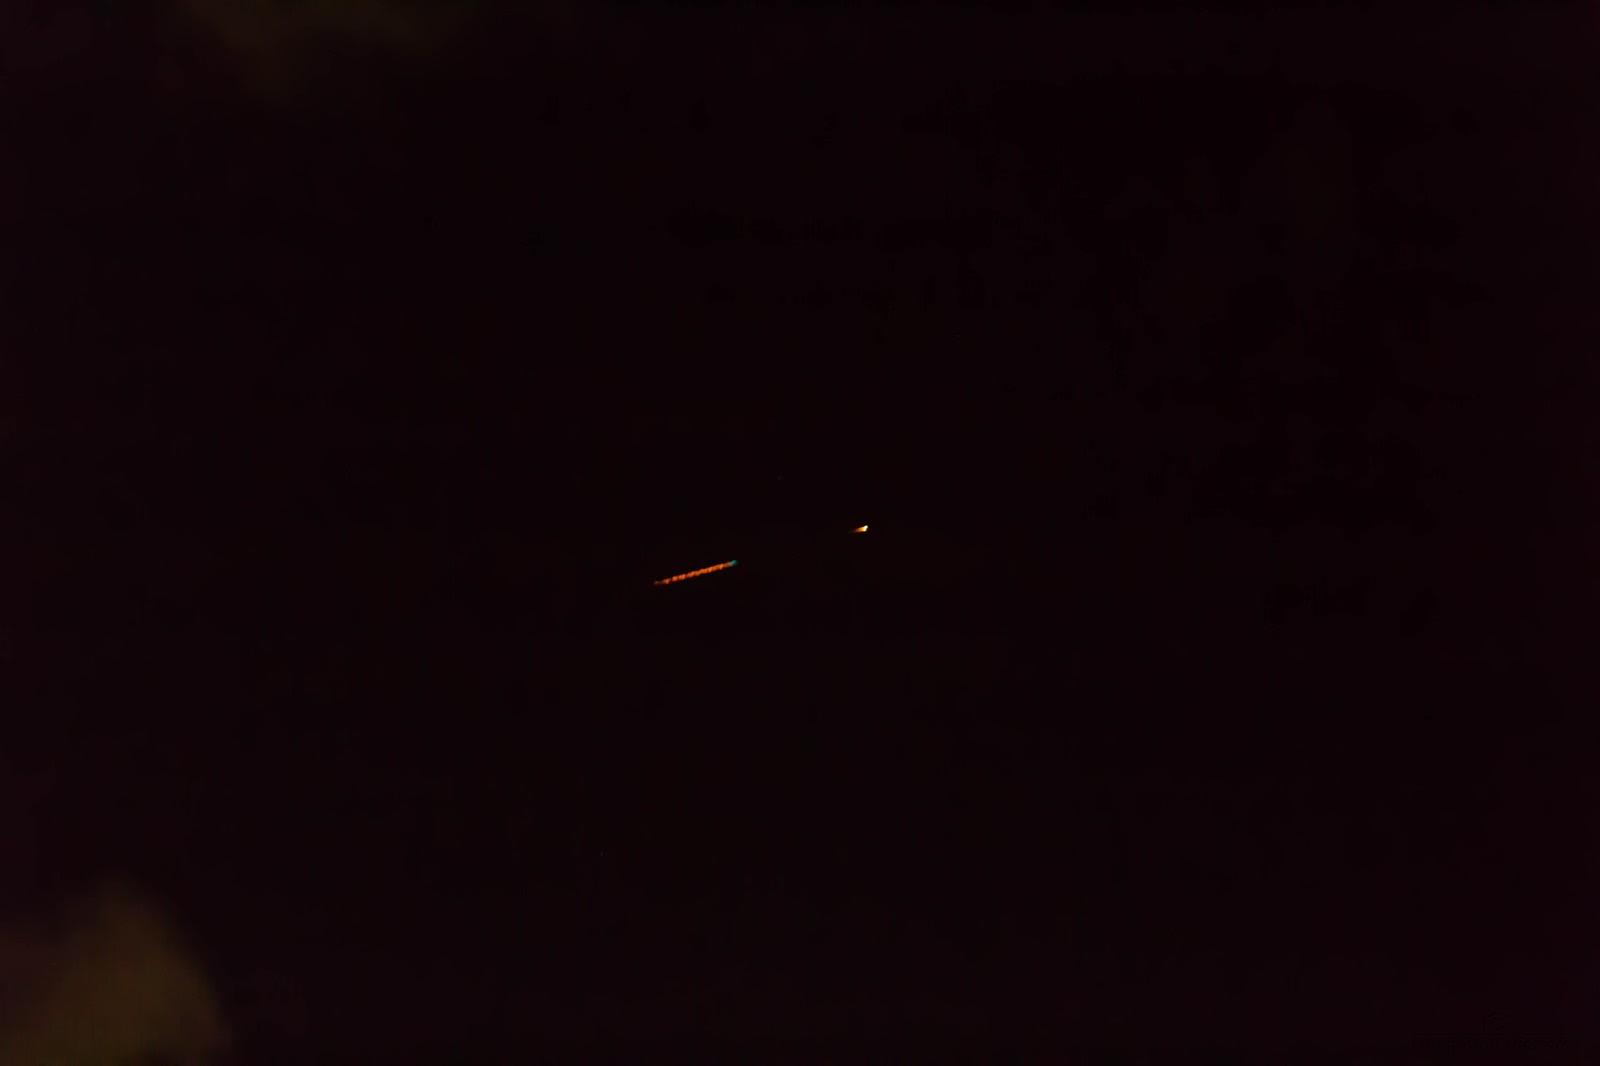 Image 4 - Meteor - Chennai, India, 16.October.2014 1.36 am IST